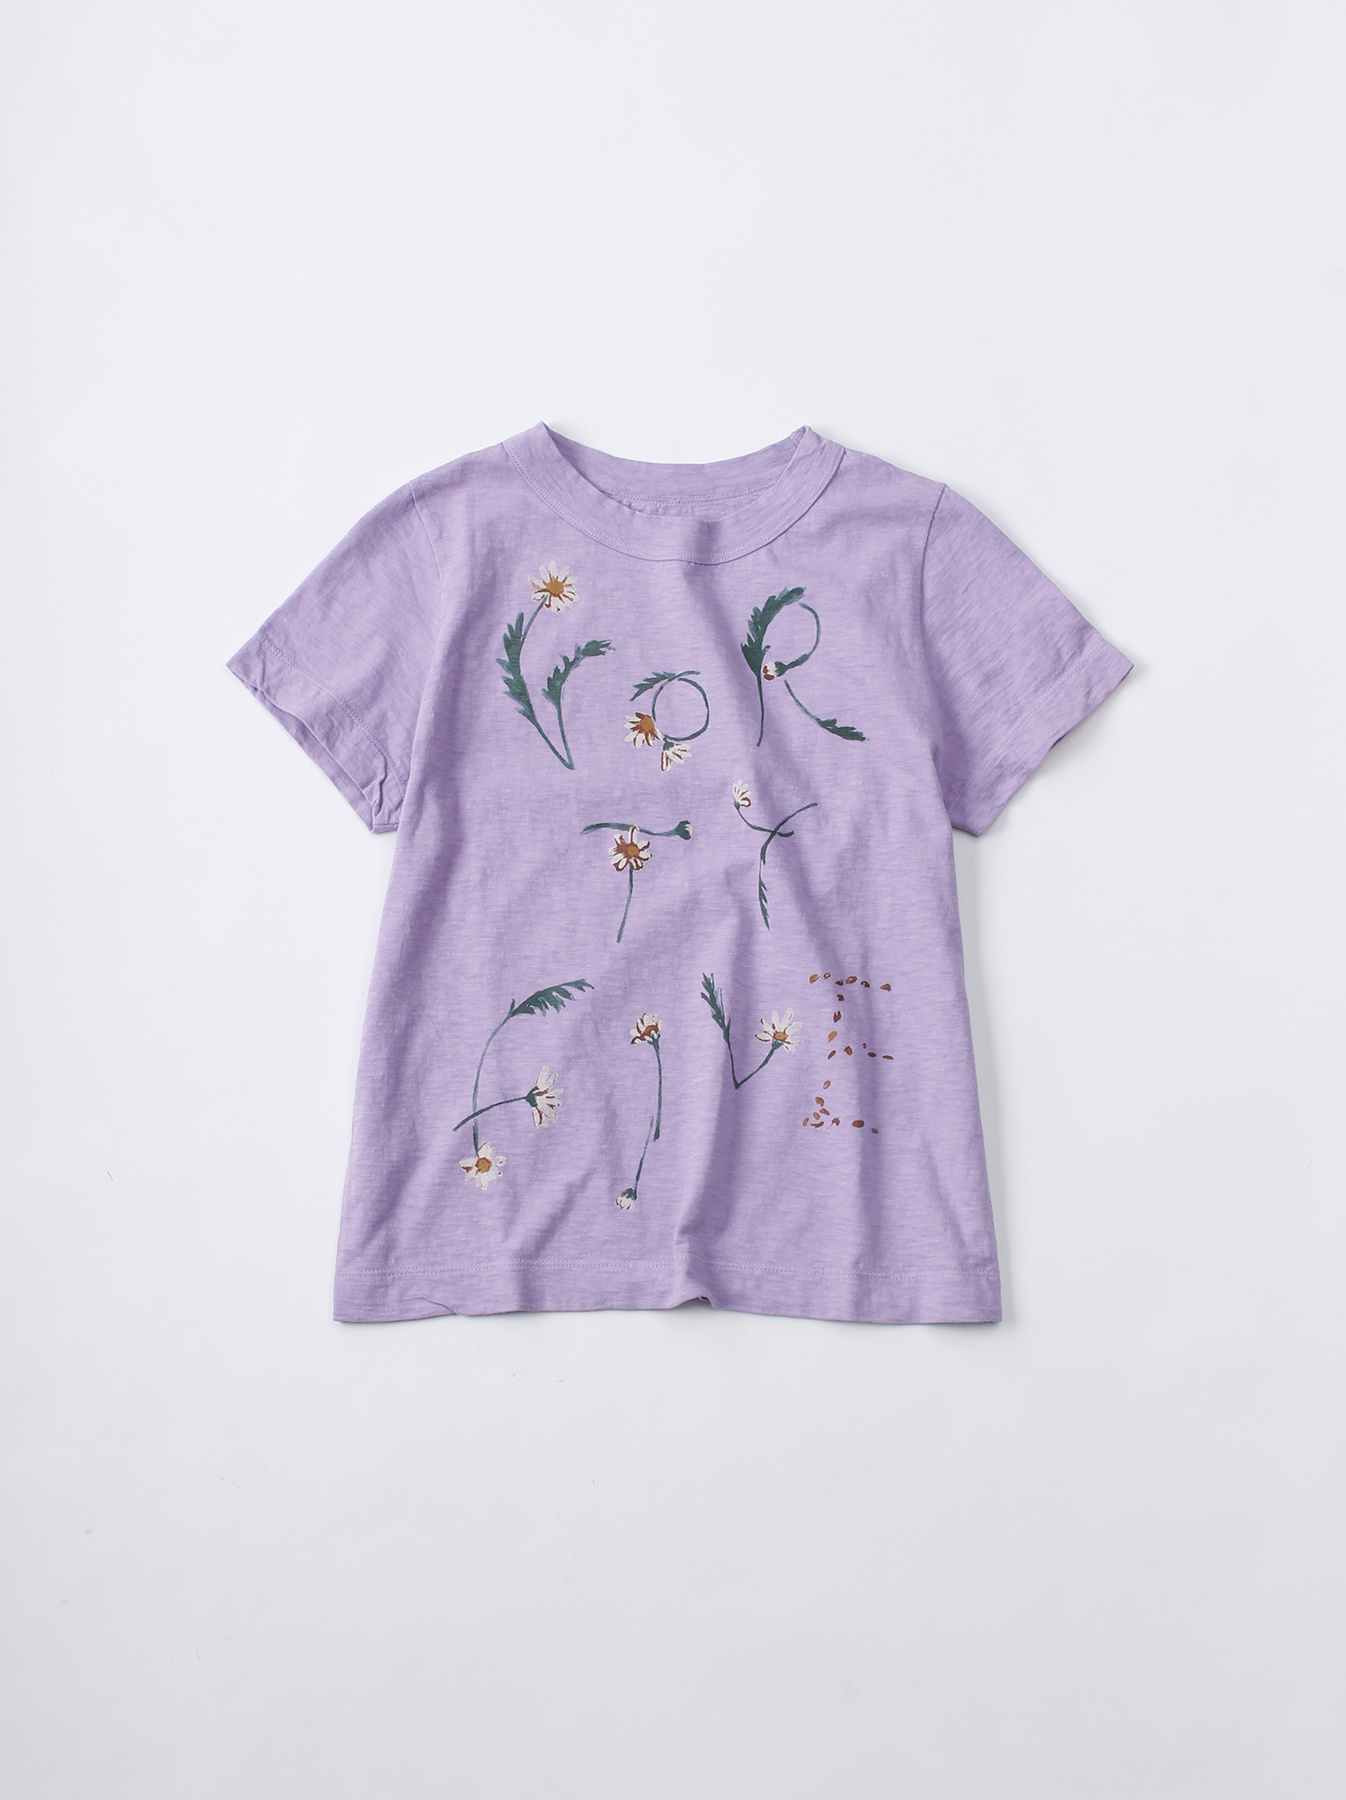 WH 45 Star T-shirt (Flower Logo)-1